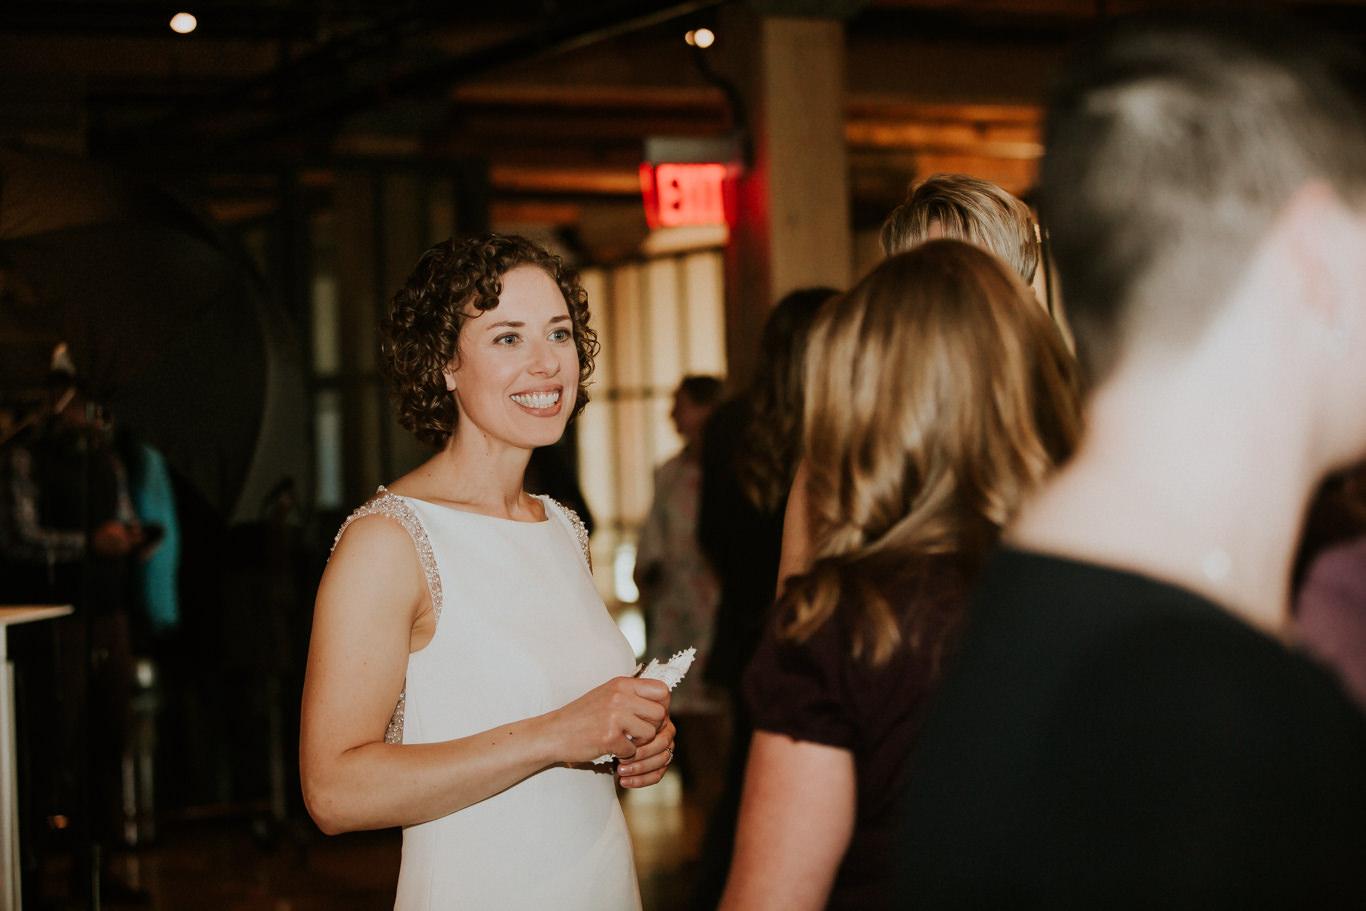 Lindsay-and-Heather-Charbar-Restaurant-Wedding-in-Calgary-142